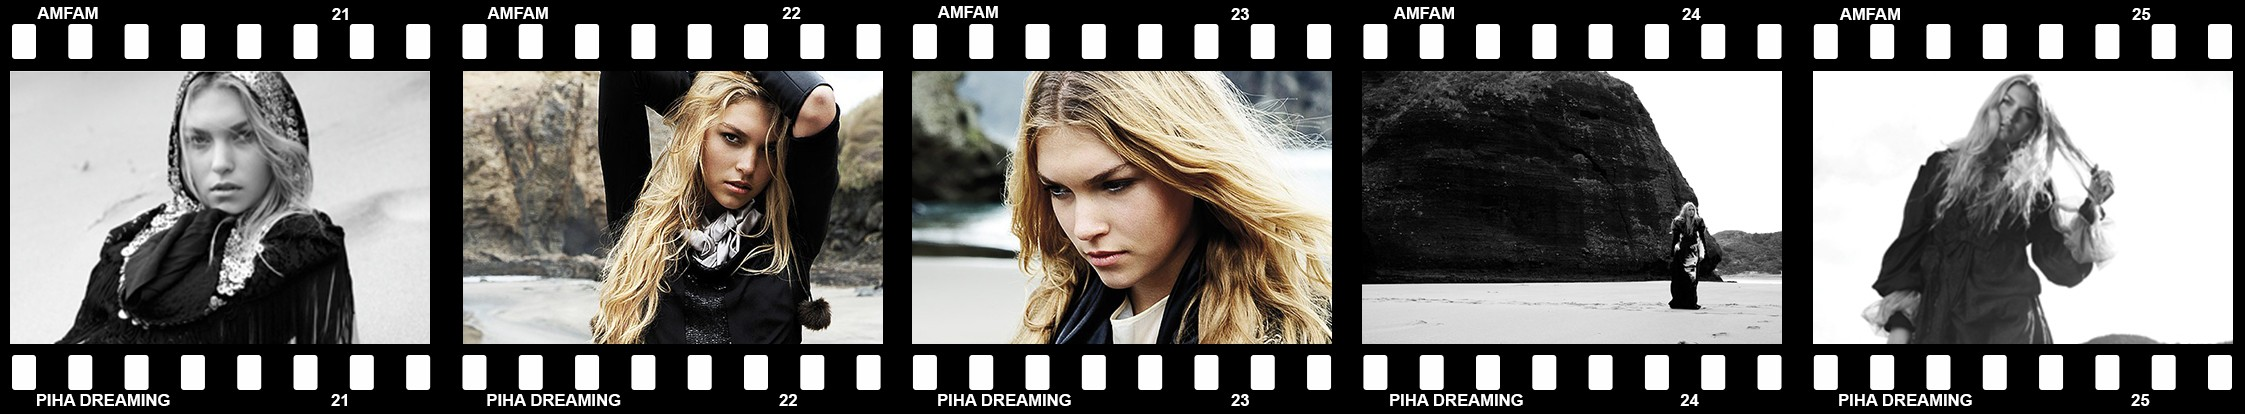 Piha dreaming